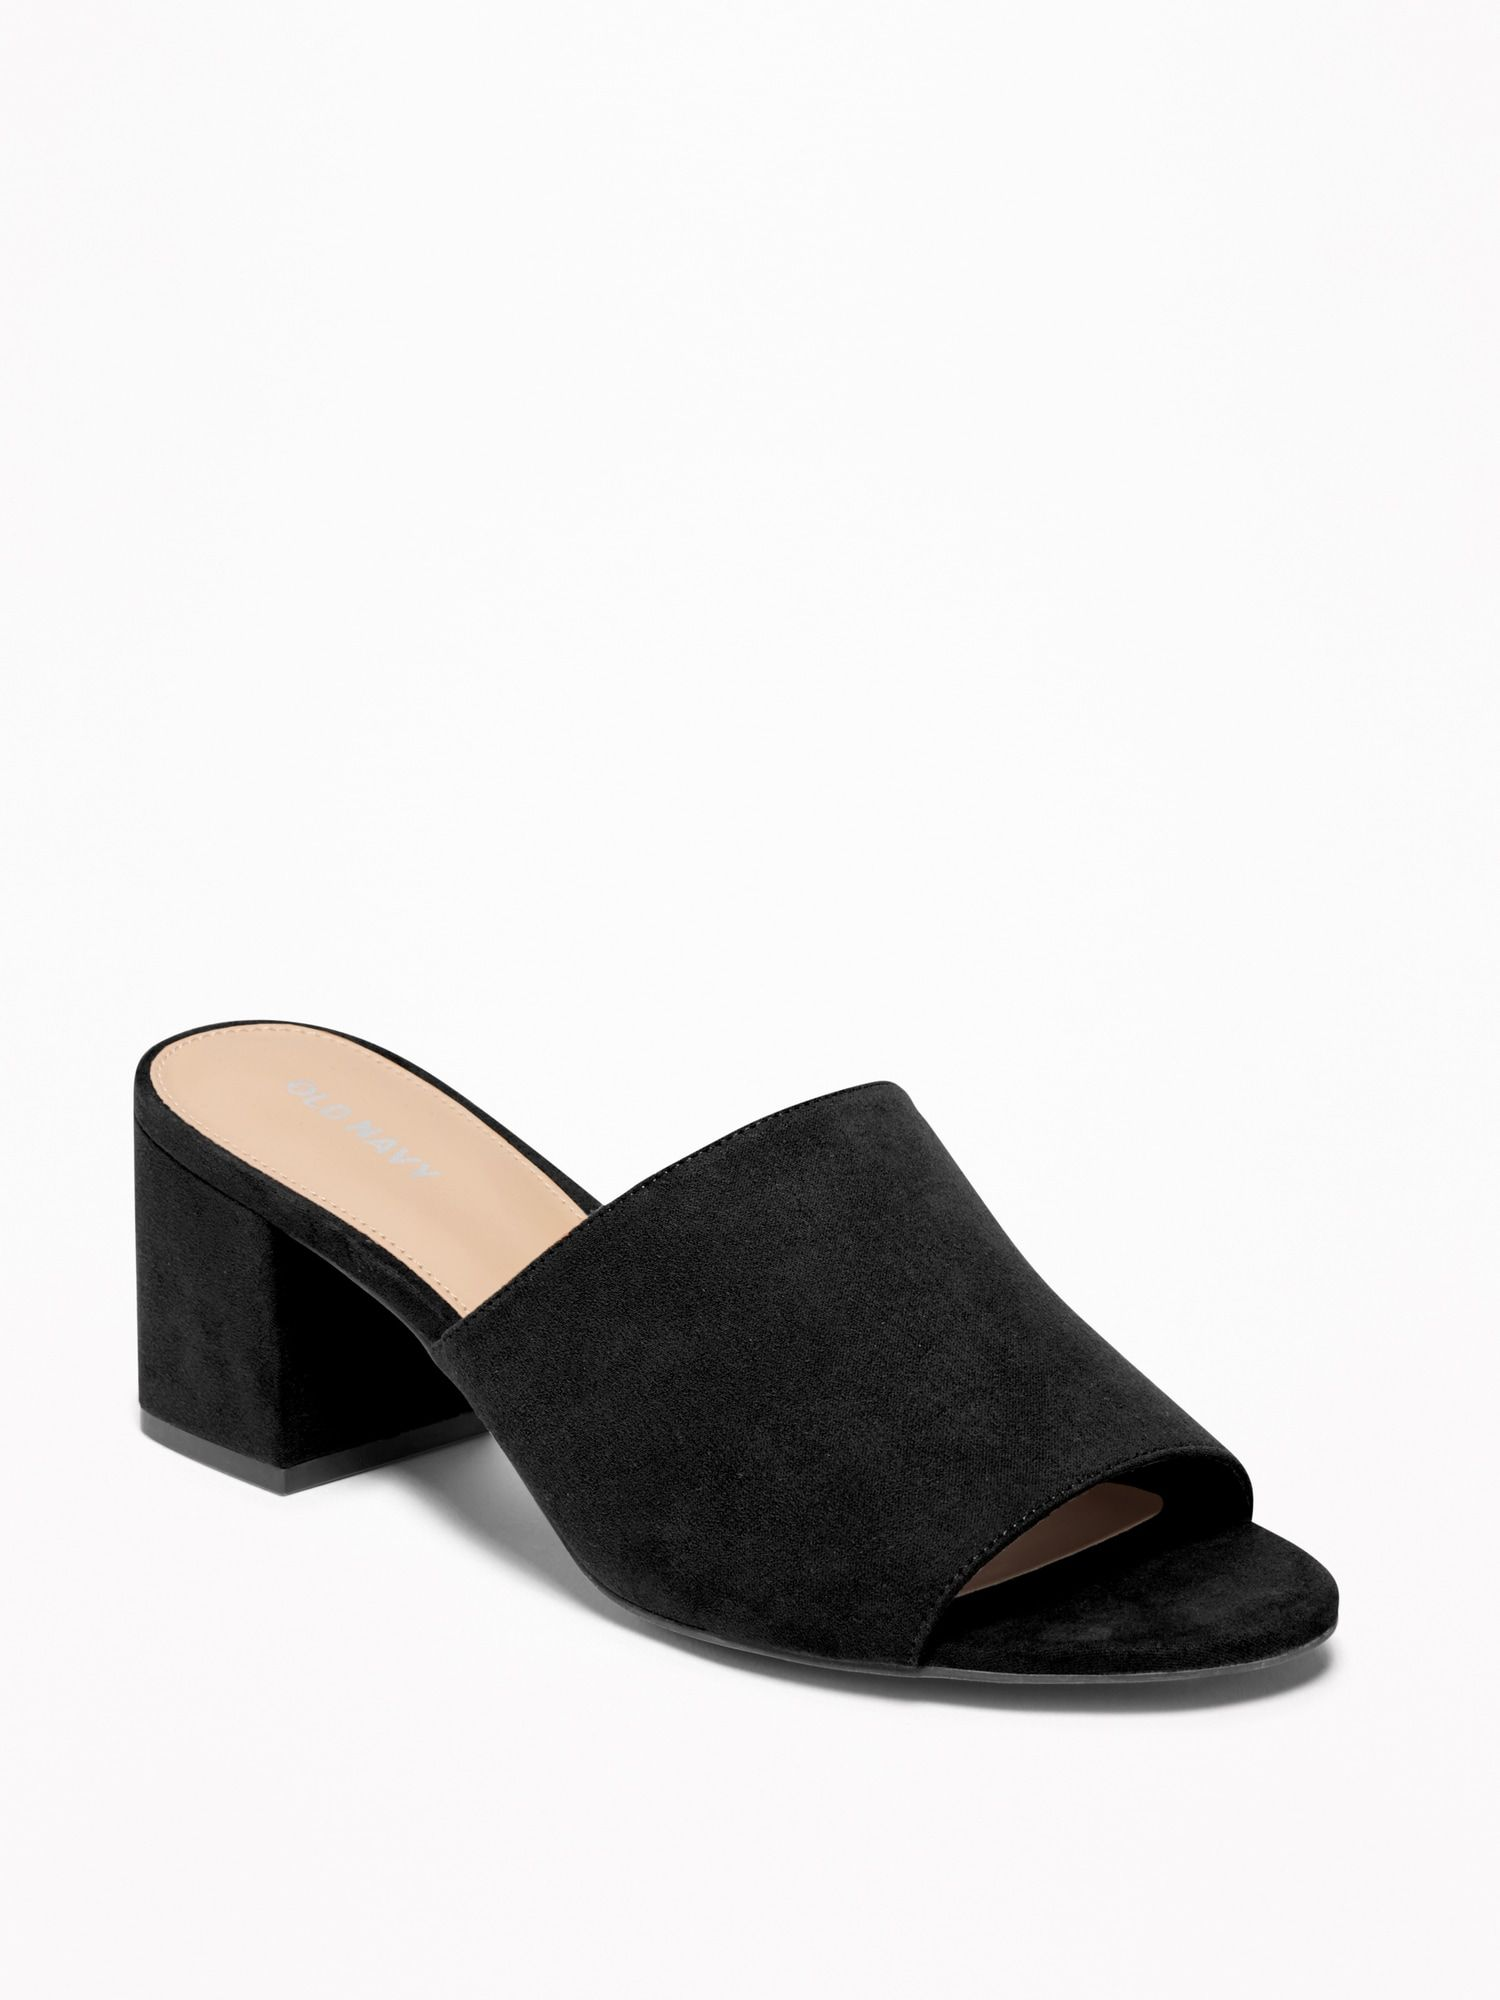 super cute big sale innovative design Sueded Mule Block-Heel Sandals for Women   Mules shoes, Heeled ...